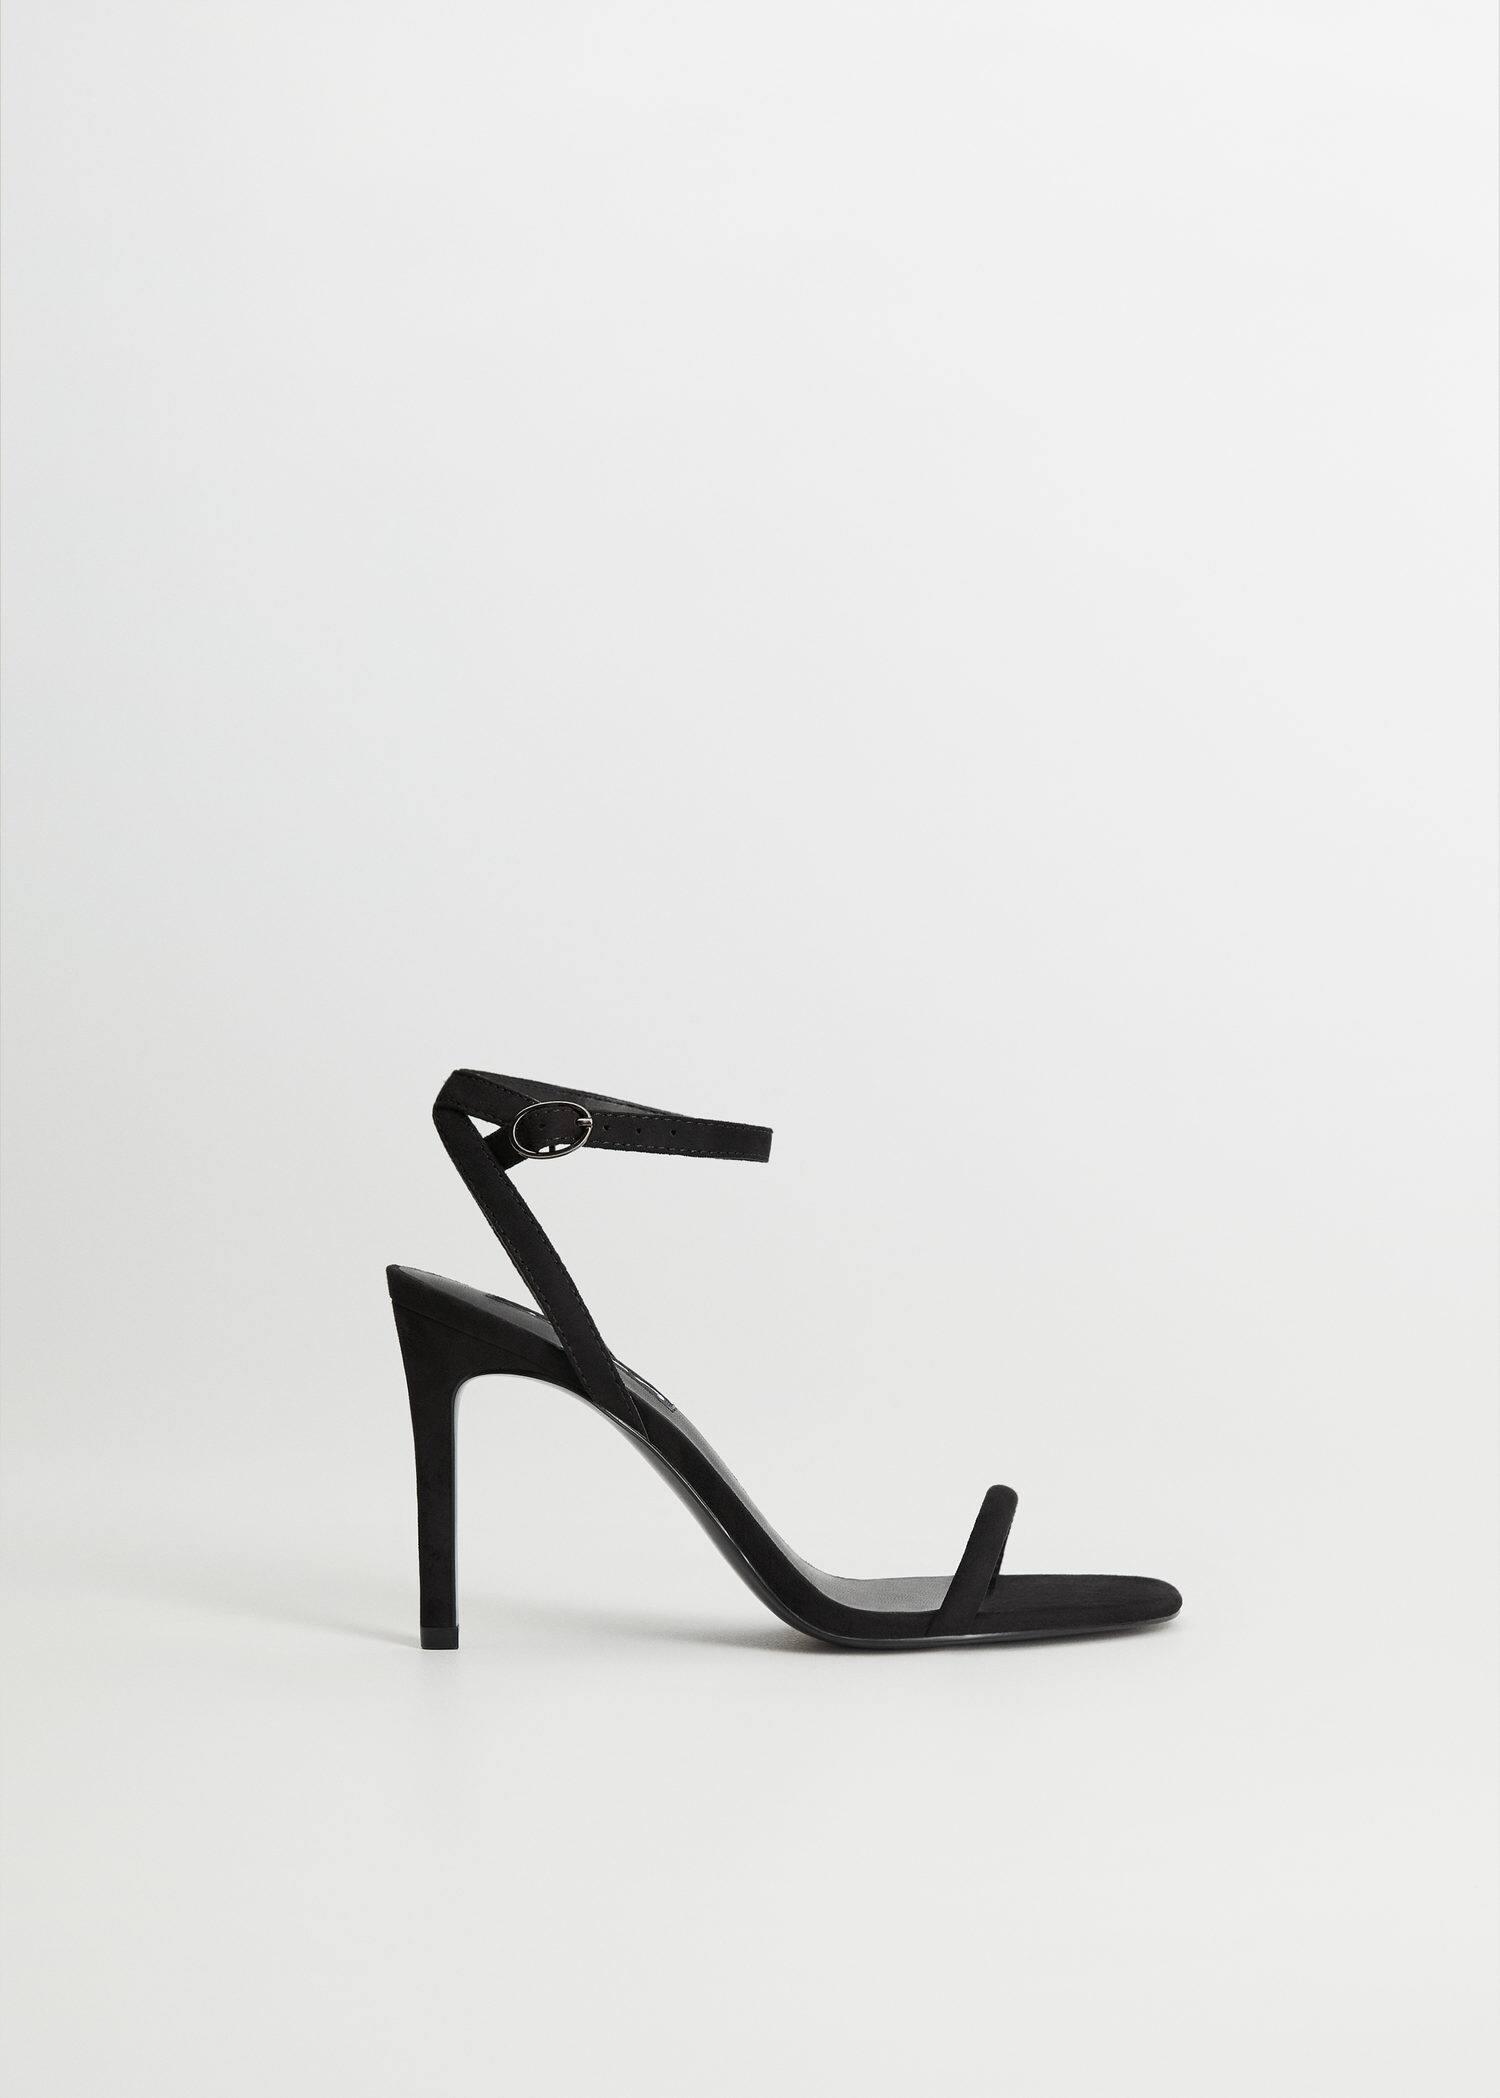 Sandália pulseira tornozelo Mulher | Sandals, Heels